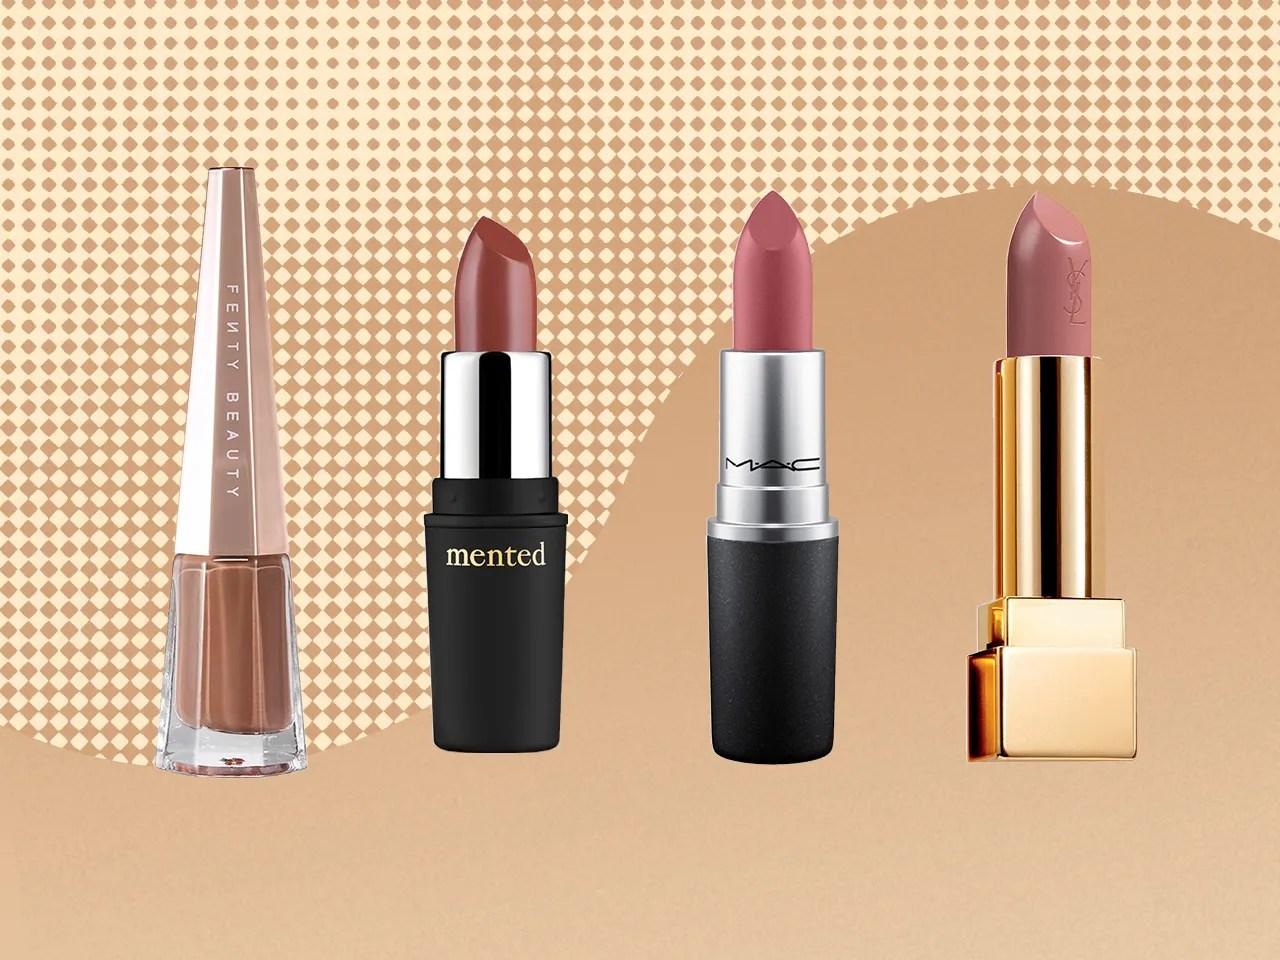 best nude lipsticks according to women